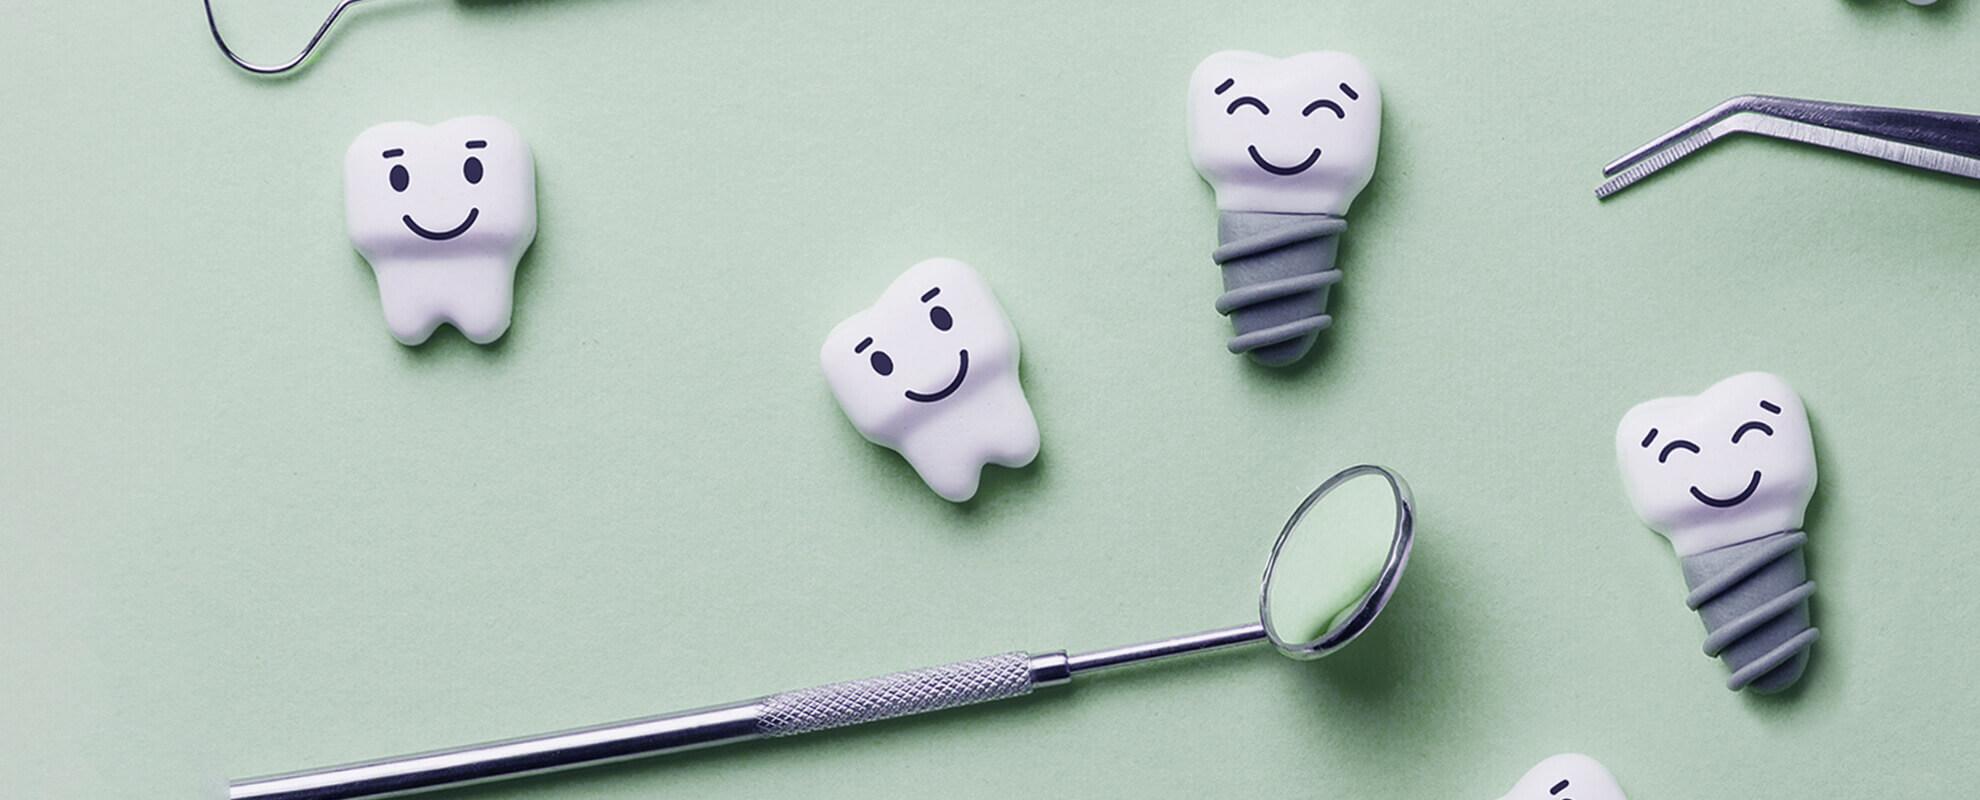 fogaszati implantatumok